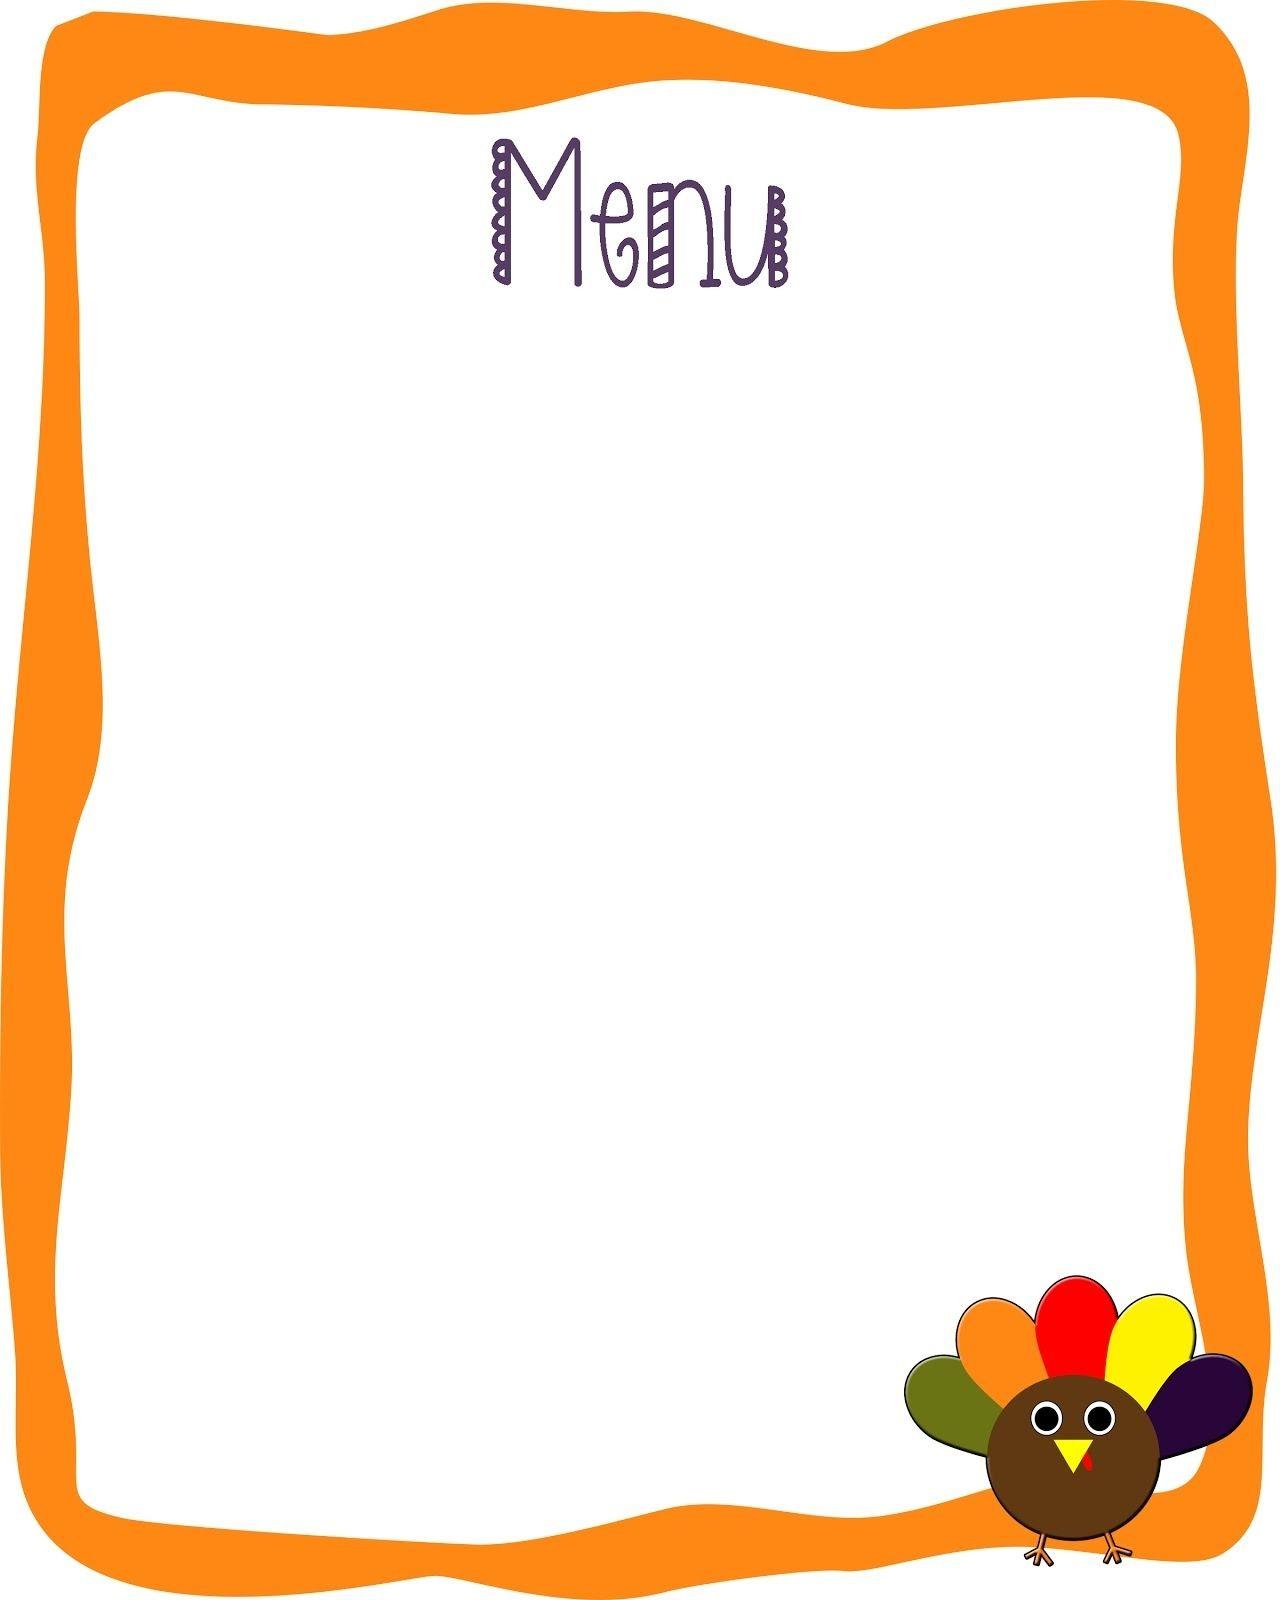 Blank Menu Template Blank Menu Template For Kids World Of Printable And Chart Photo Blank Menu Template Restaurant Menu Template Menu Planner Printable Free